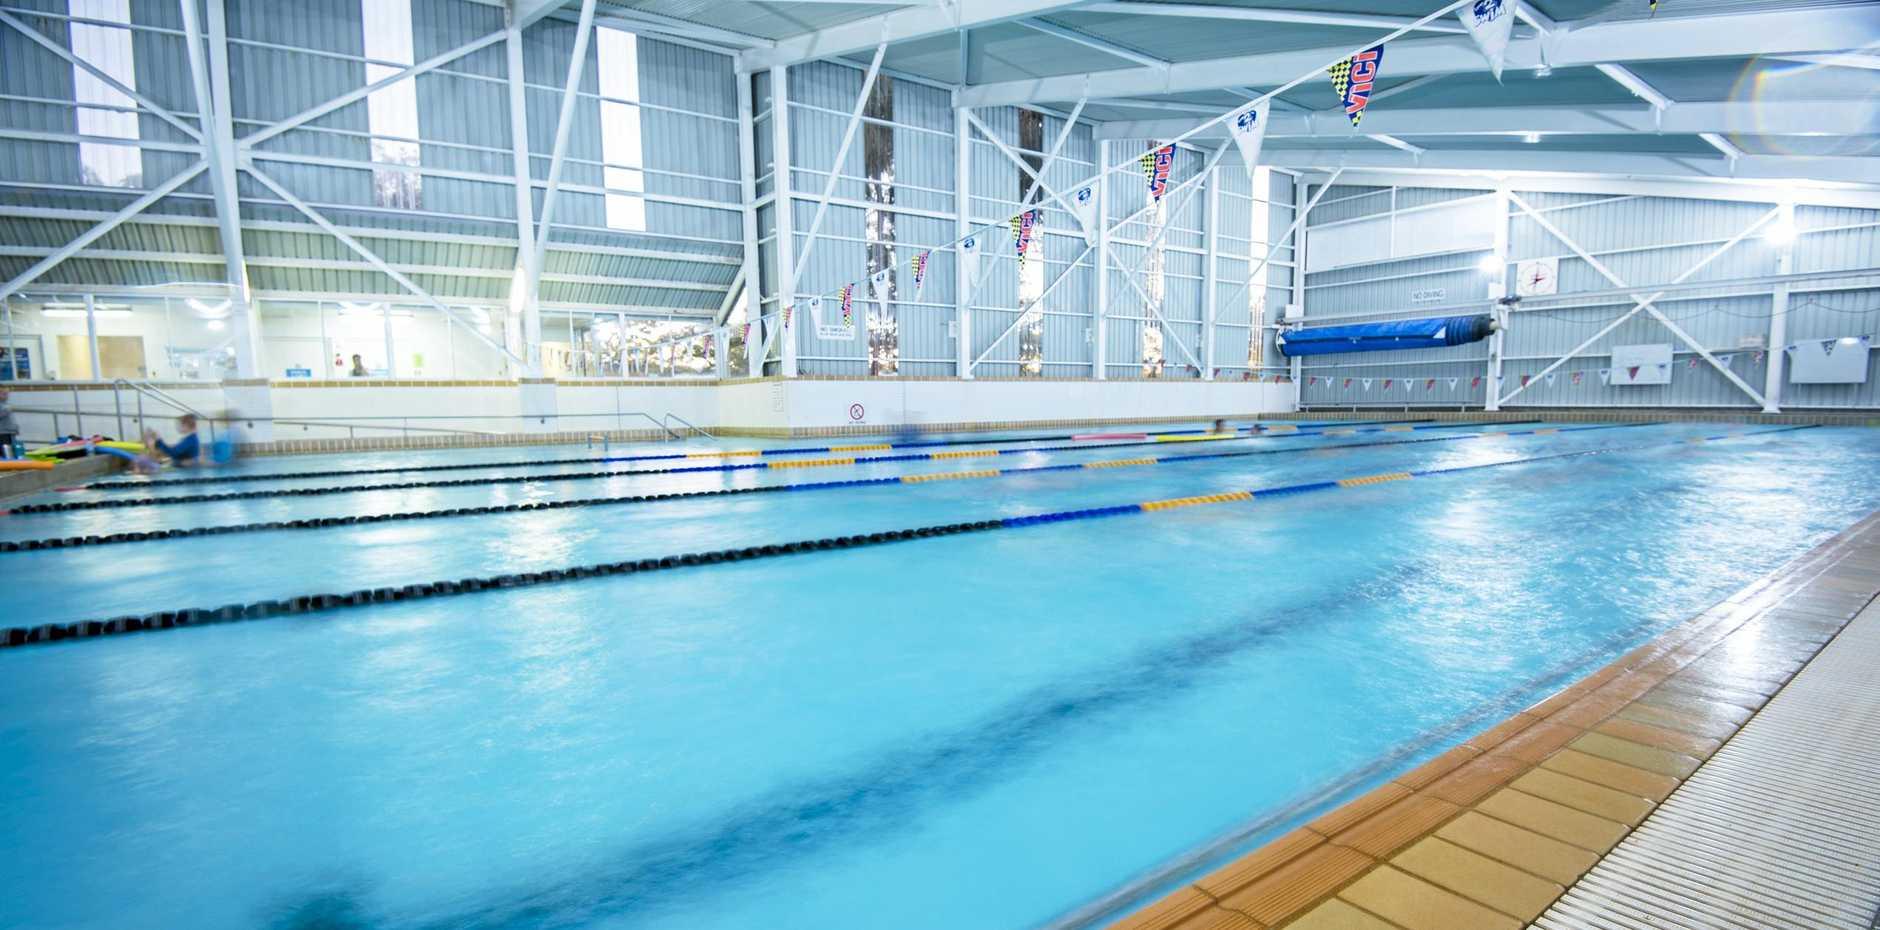 The Gladstone Aquatic Centre's heated pool.